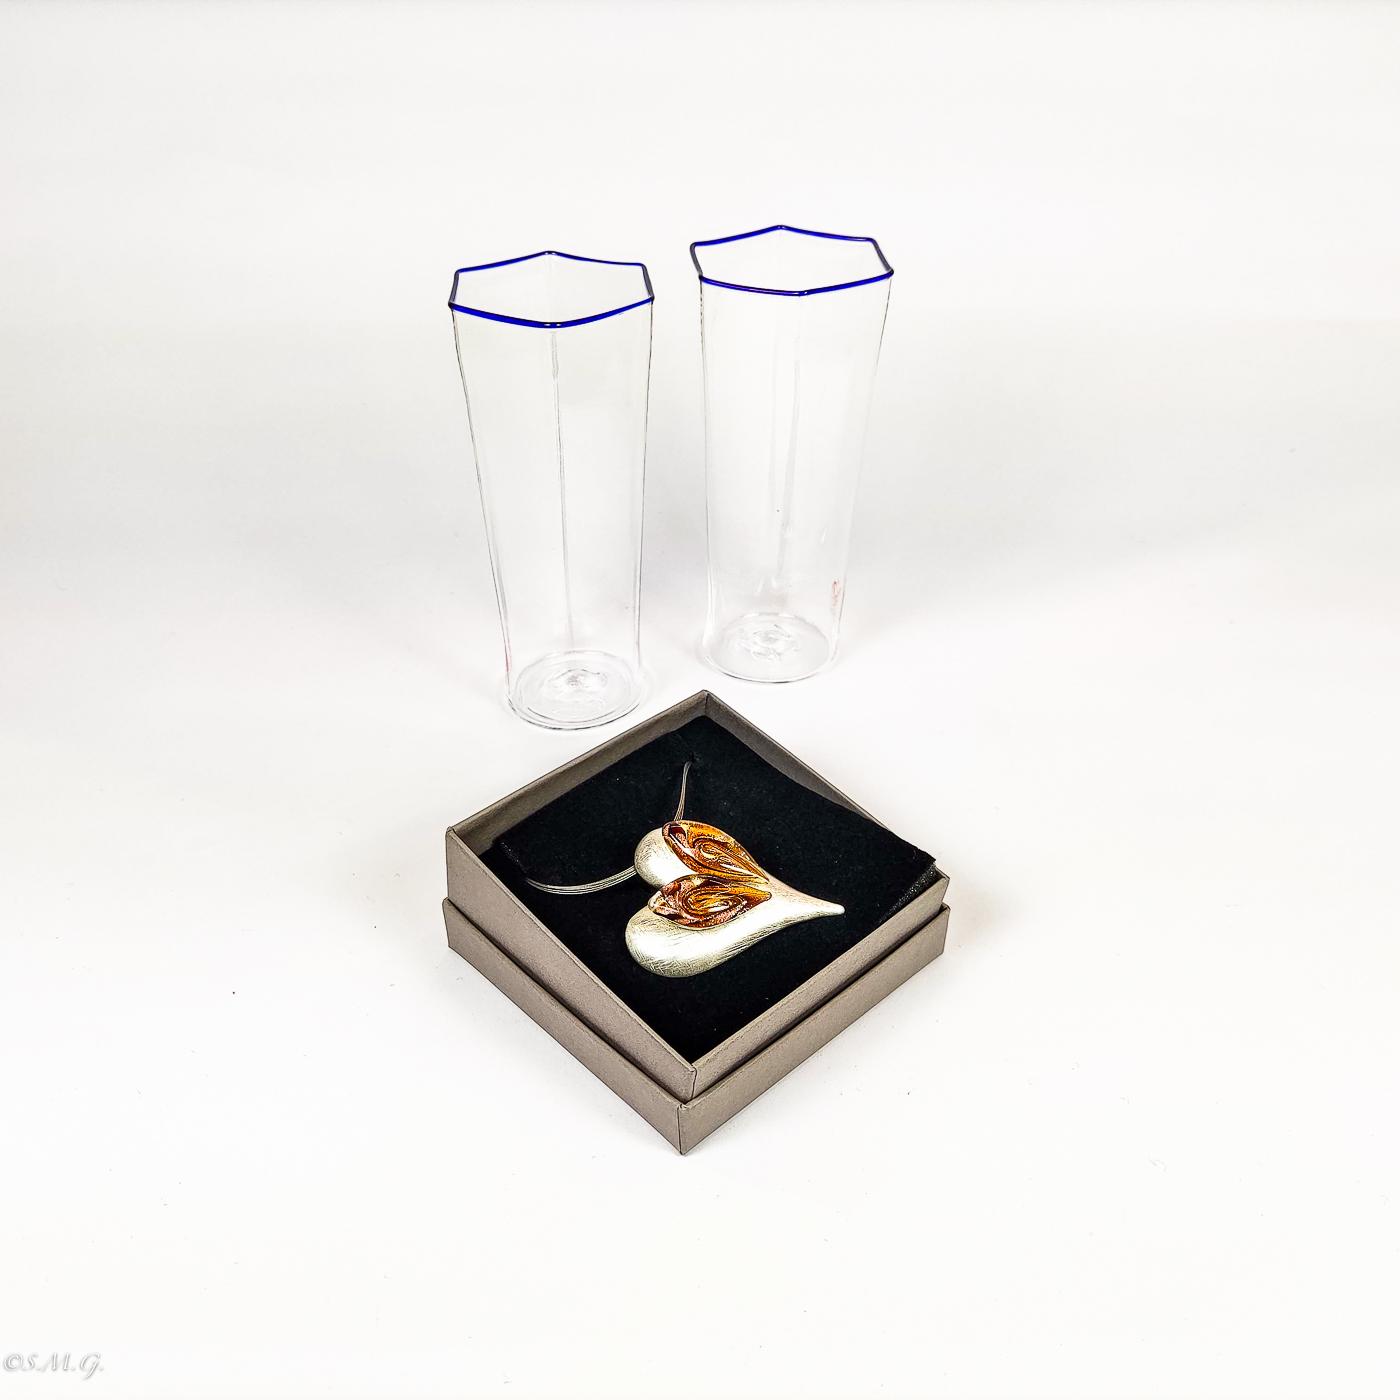 2 hexagonal Murano Glass tumblers and heart shape pendant